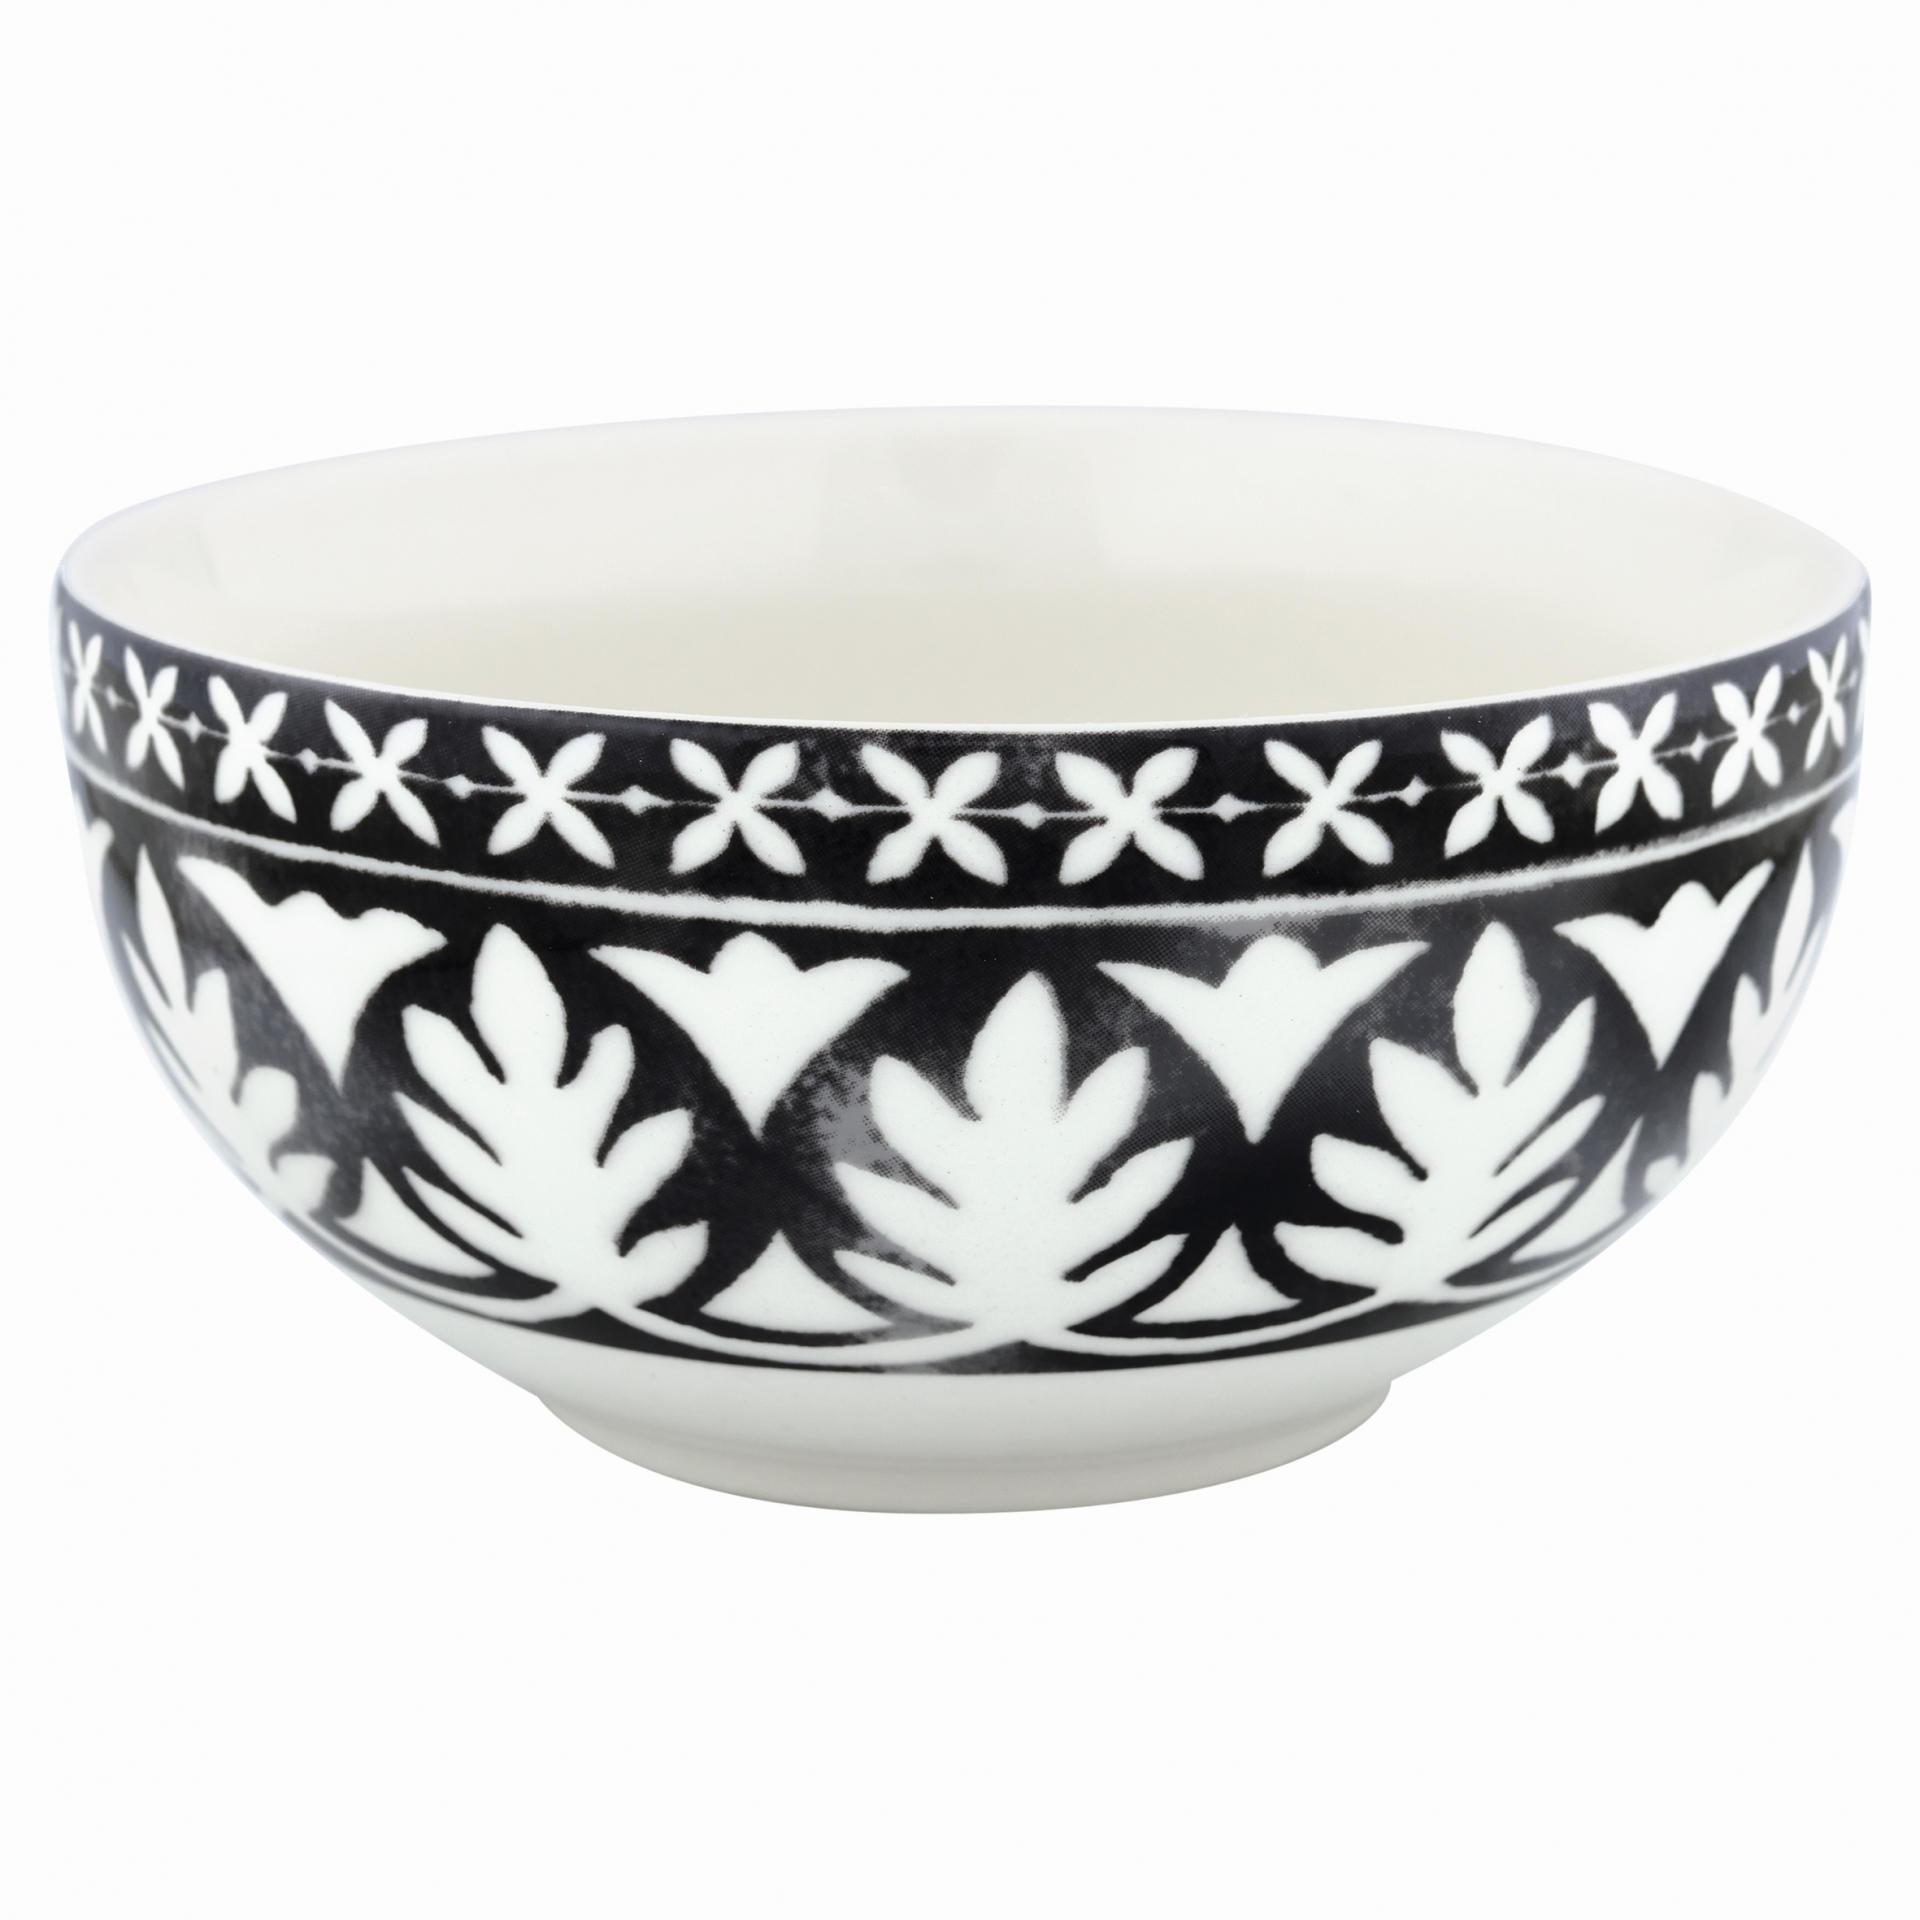 GREEN GATE Porcelánová miska Sasha black, černá barva, bílá barva, porcelán